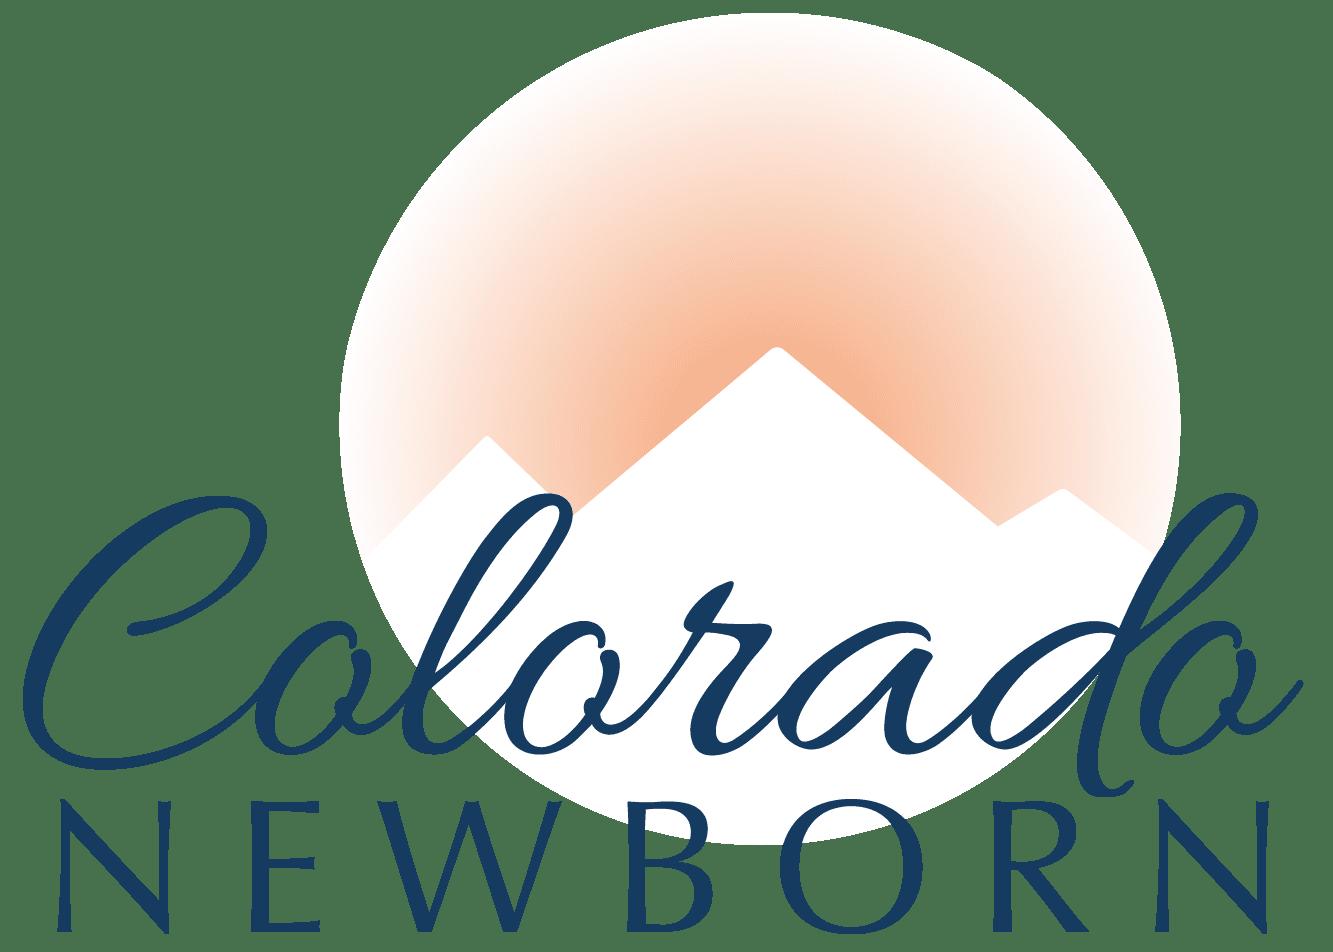 Colorado Newborn